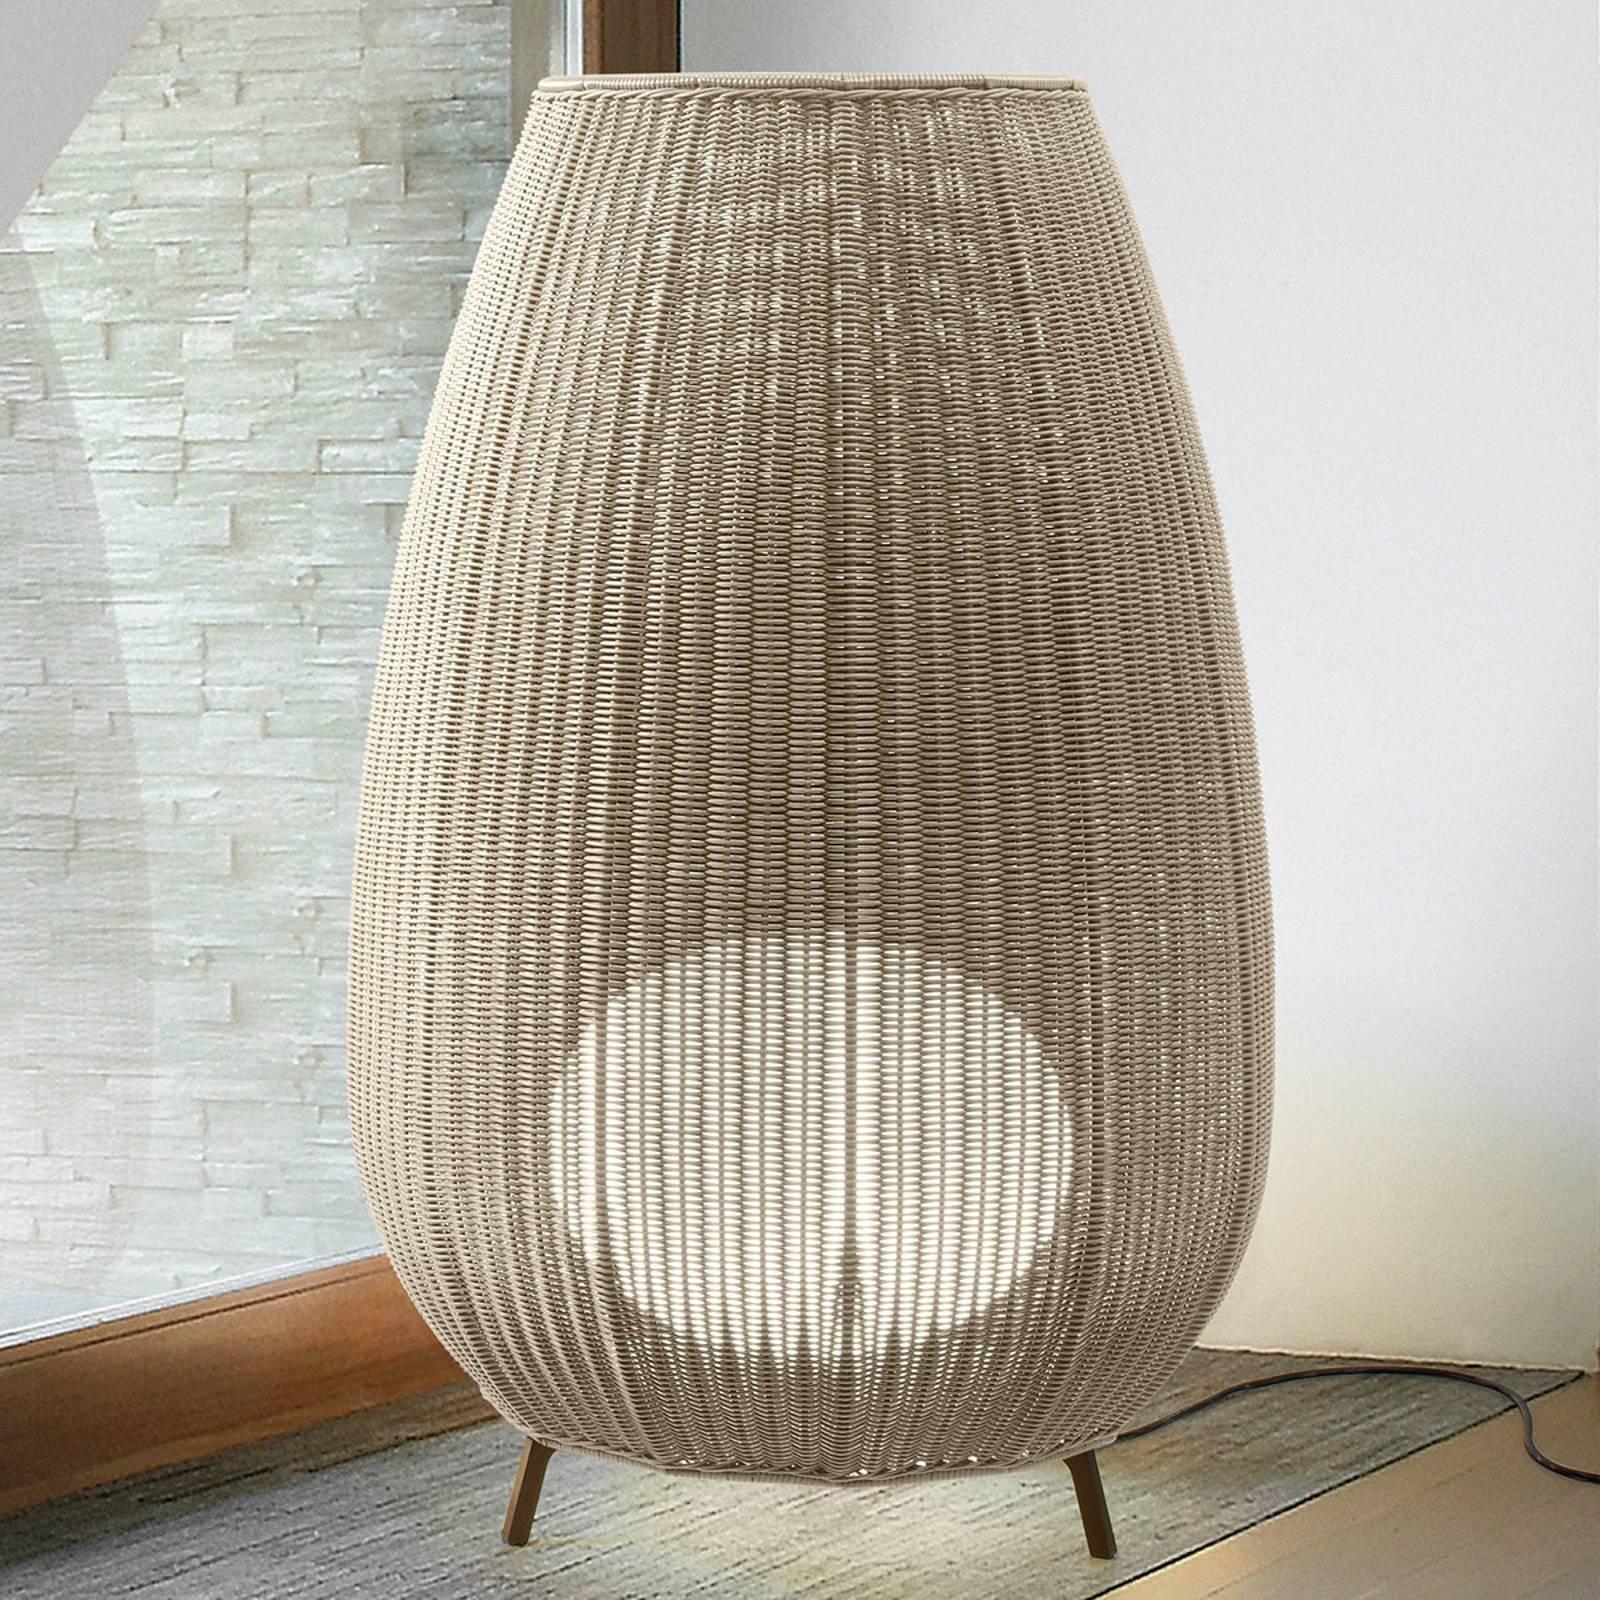 Bover Amphora 03 - terassivalaisin, vaaleanbeige